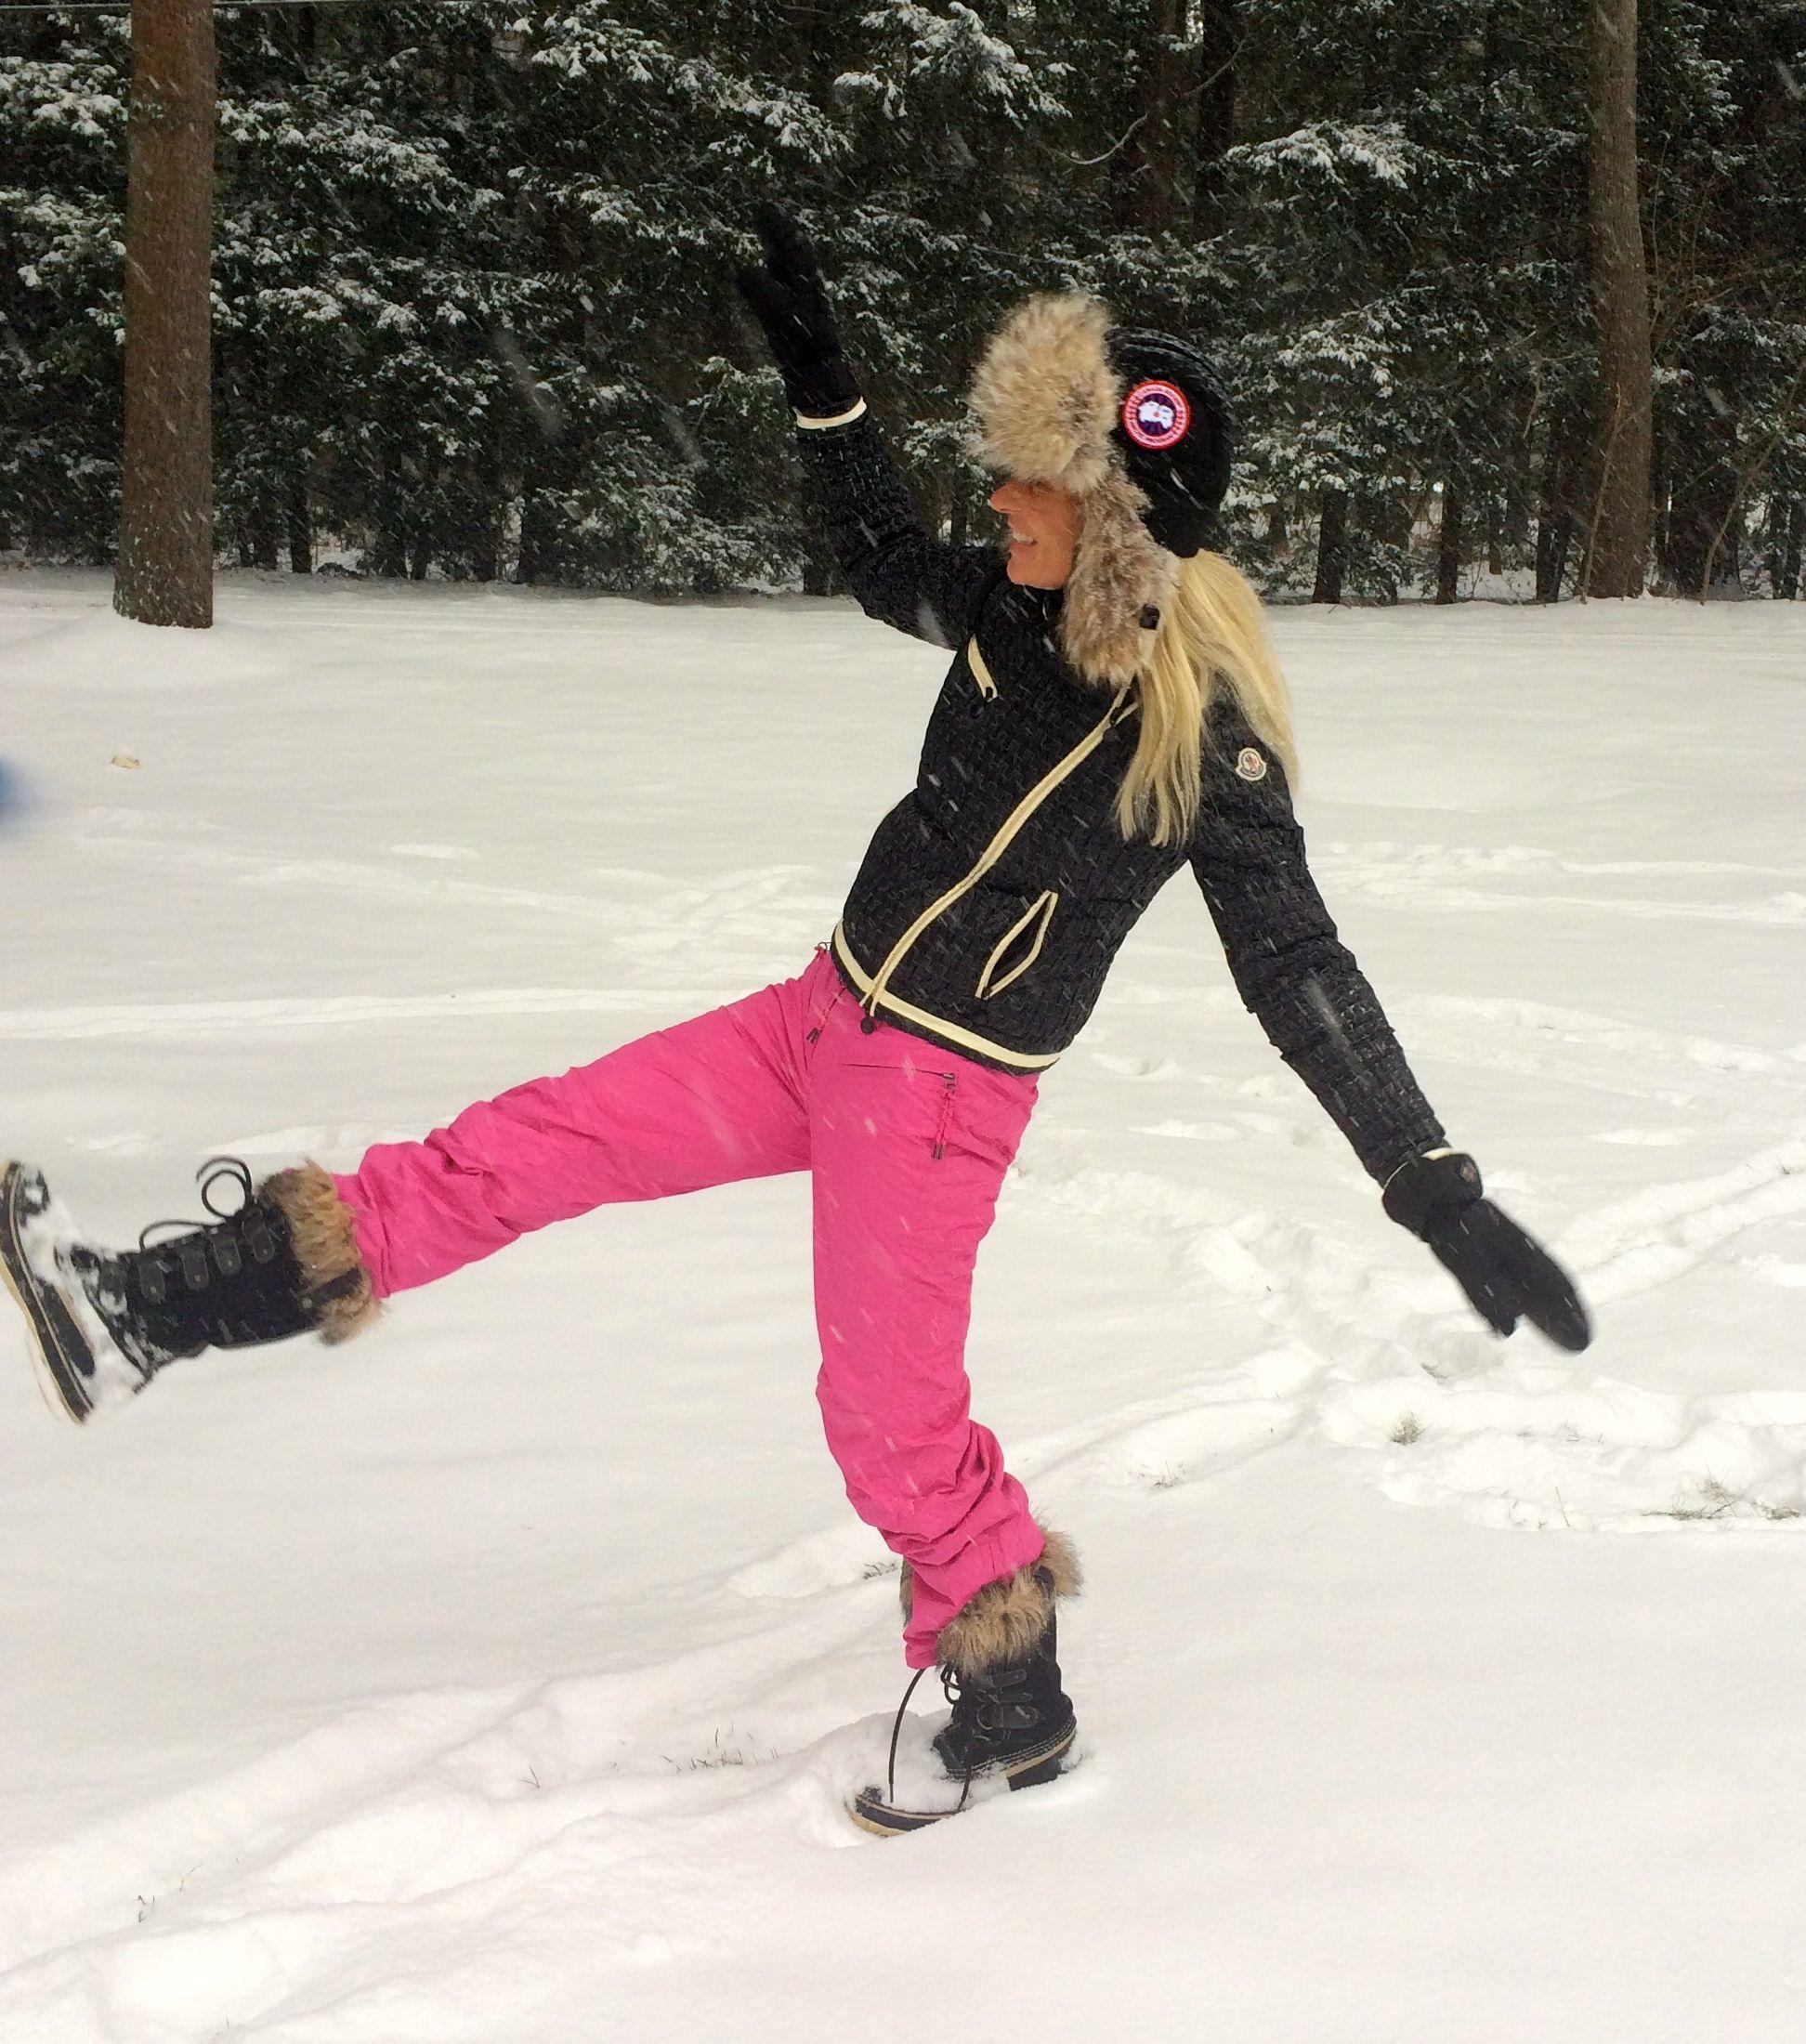 canada goose ski wear